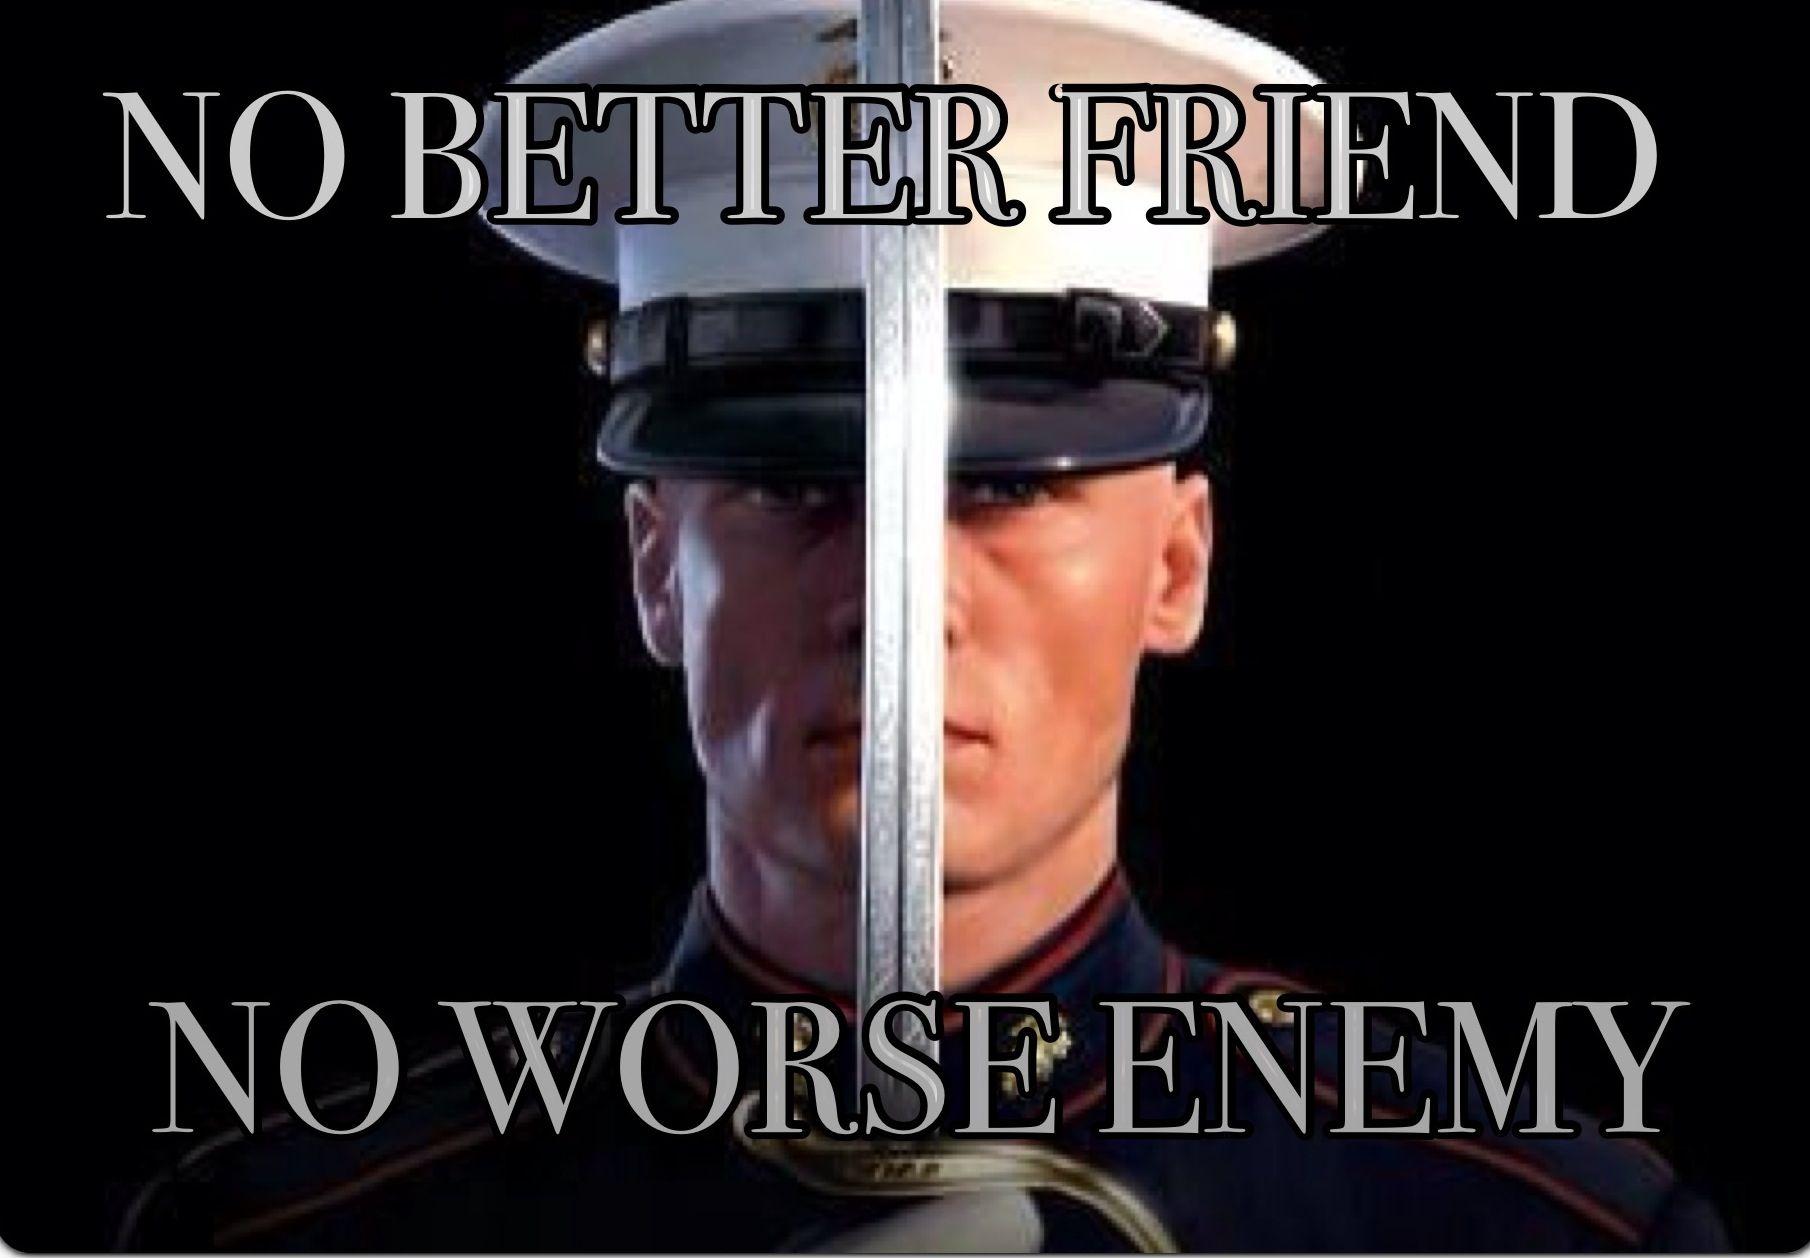 USMC No better friend. No worse enemy. Marine corps